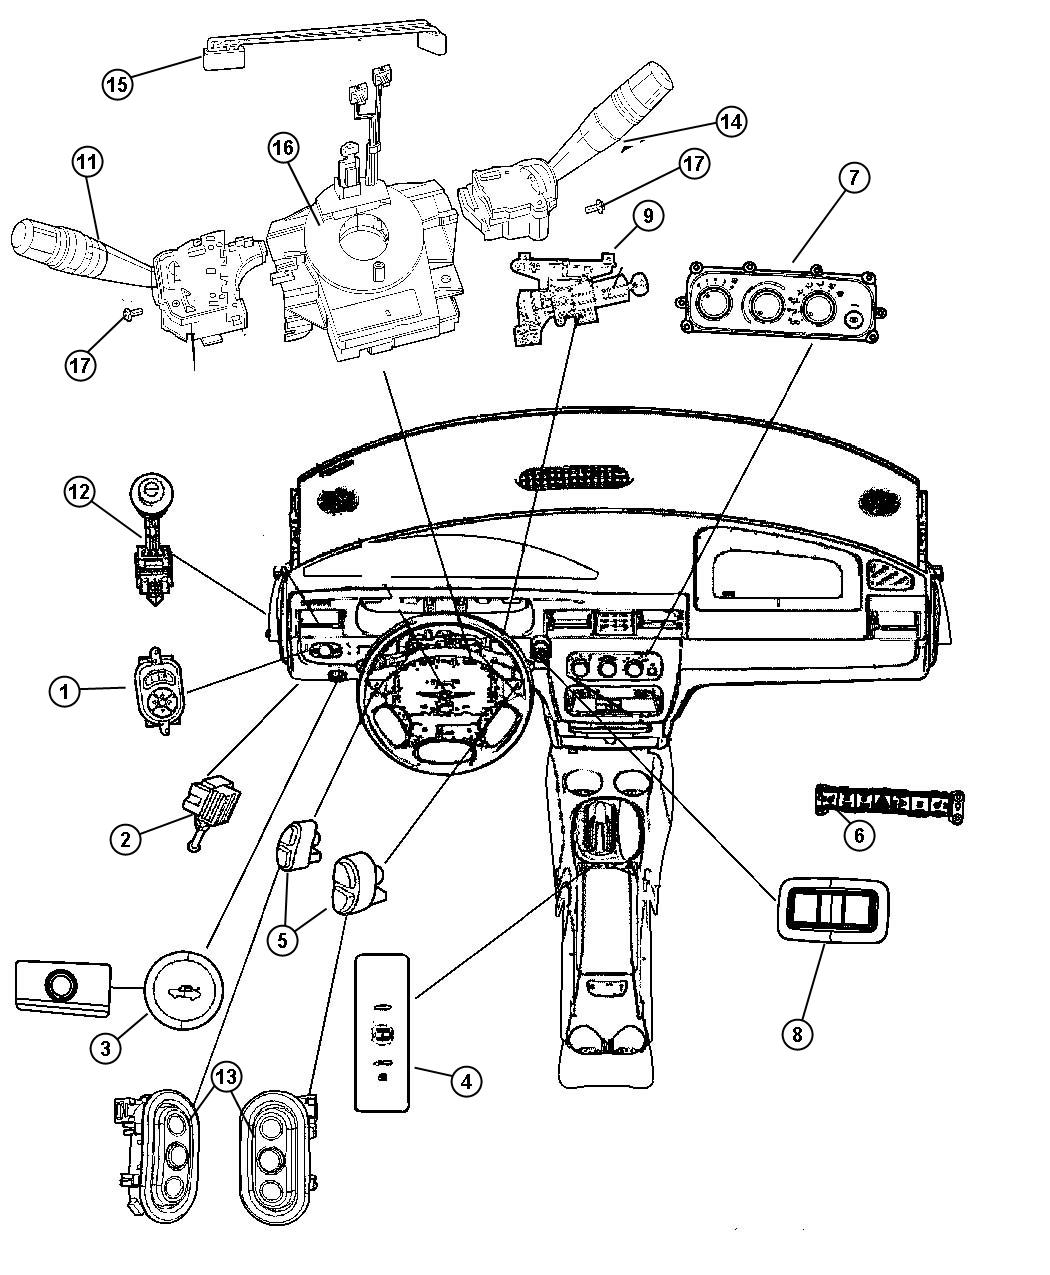 Chrysler Sebring Switch Ignition Export Trim All